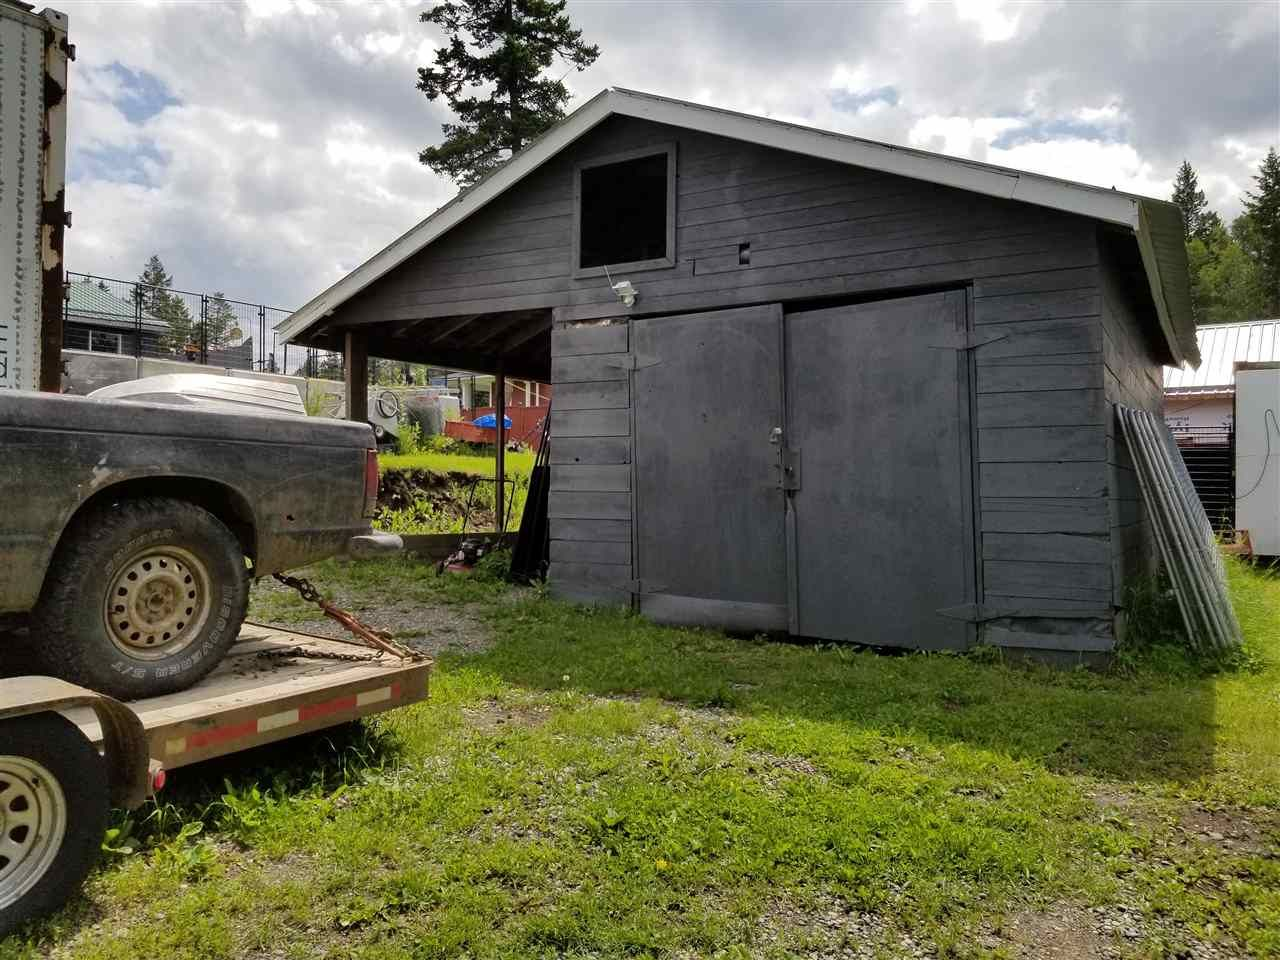 Photo 13: Photos: 1113 DOG CREEK Road in Williams Lake: Esler/Dog Creek House for sale (Williams Lake (Zone 27))  : MLS®# R2472139